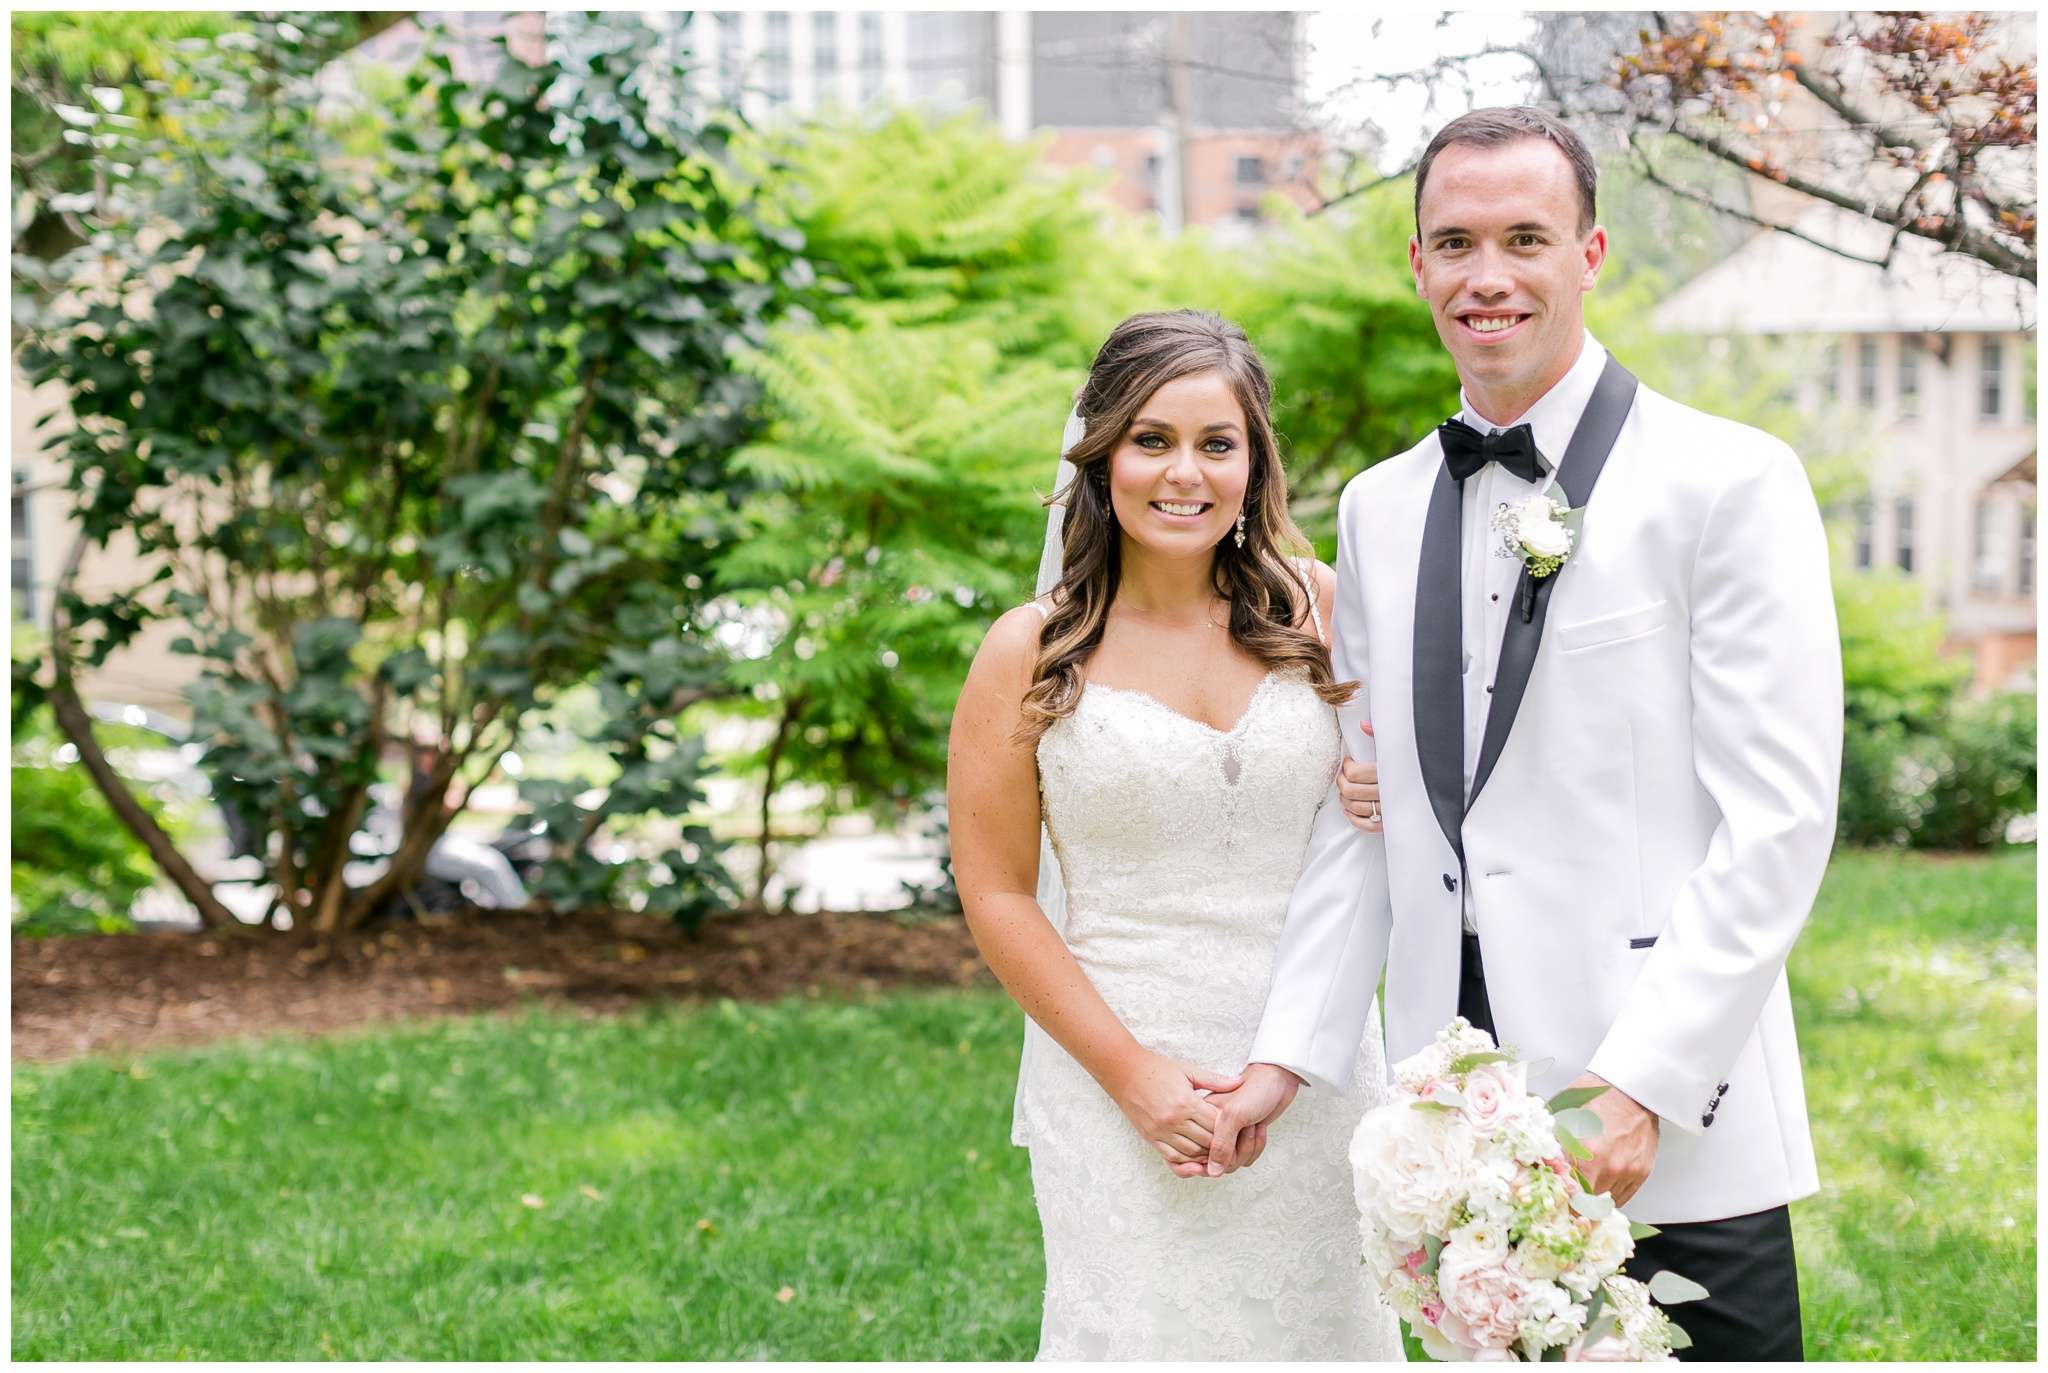 UW_Memorial_Union_wedding_madison_wisconsin_wedding_photographers_4600.jpg